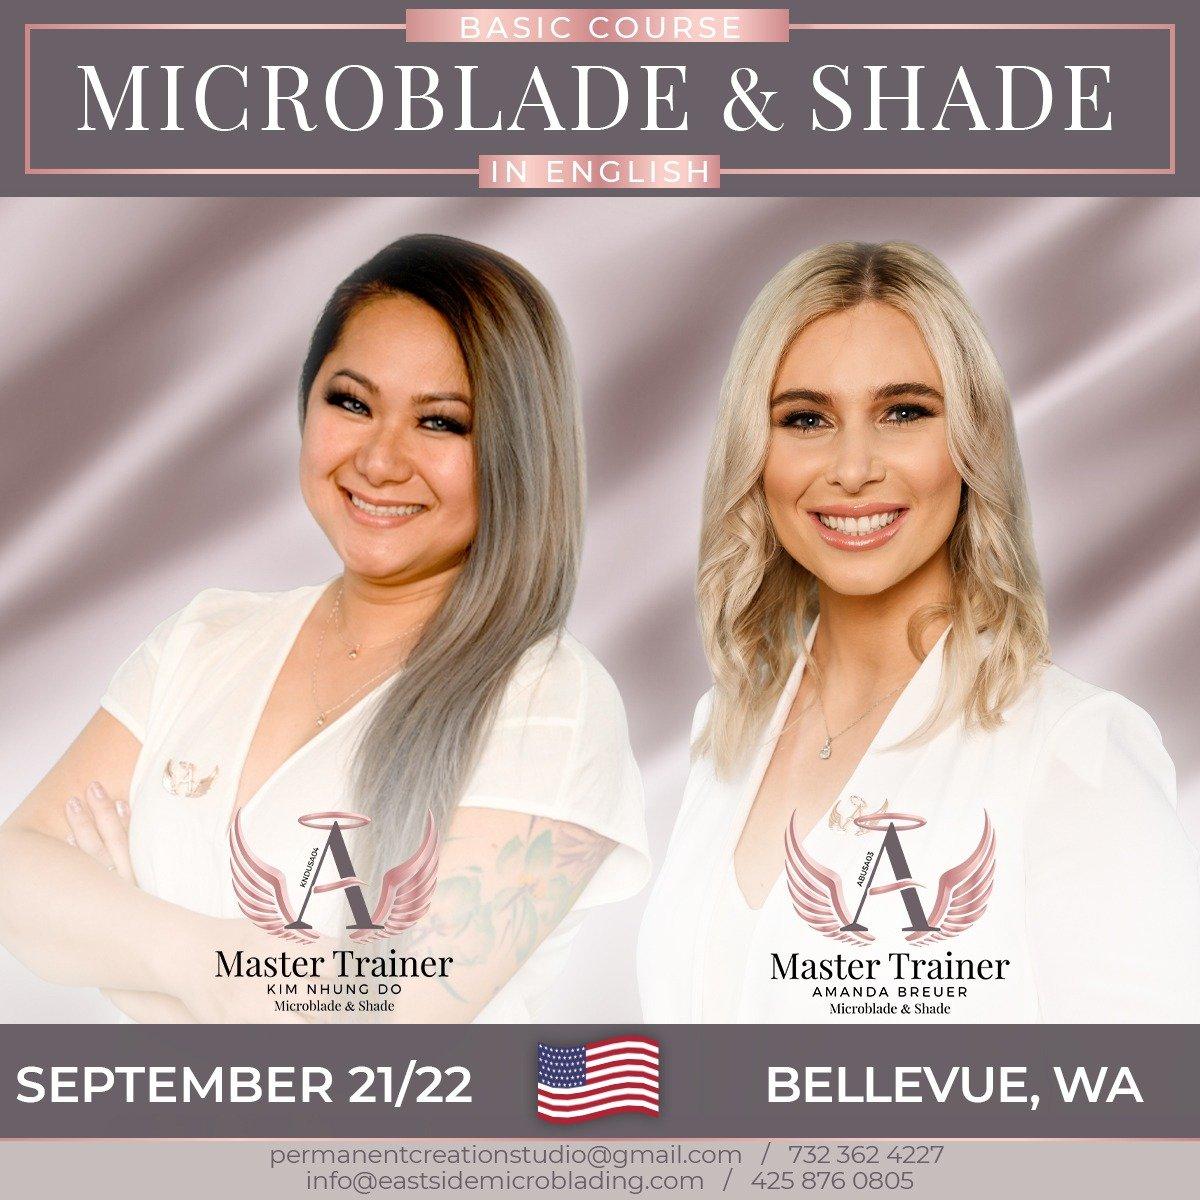 September 21-22, 2019   Bellevue, WA